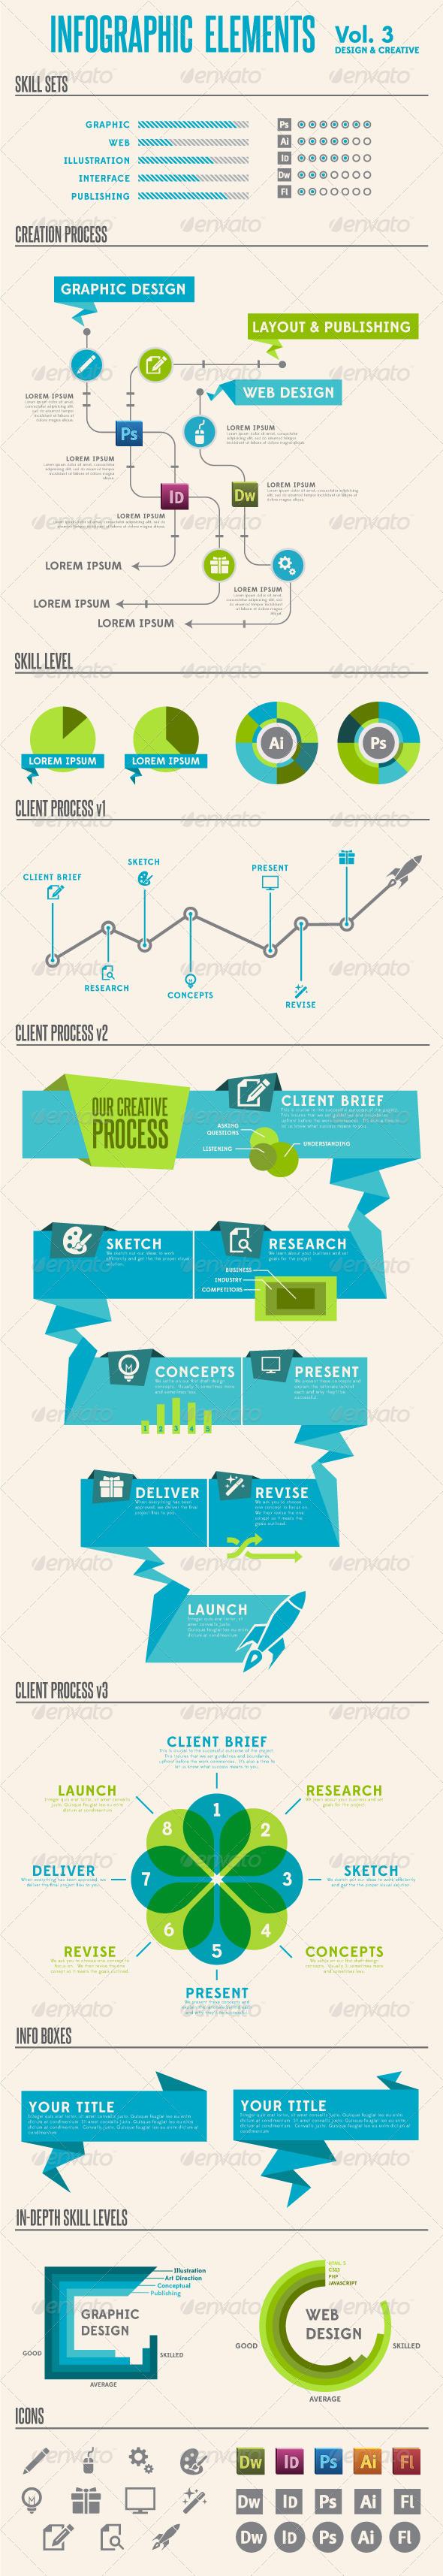 GraphicRiver Infographic Elements Vol 3 3109226